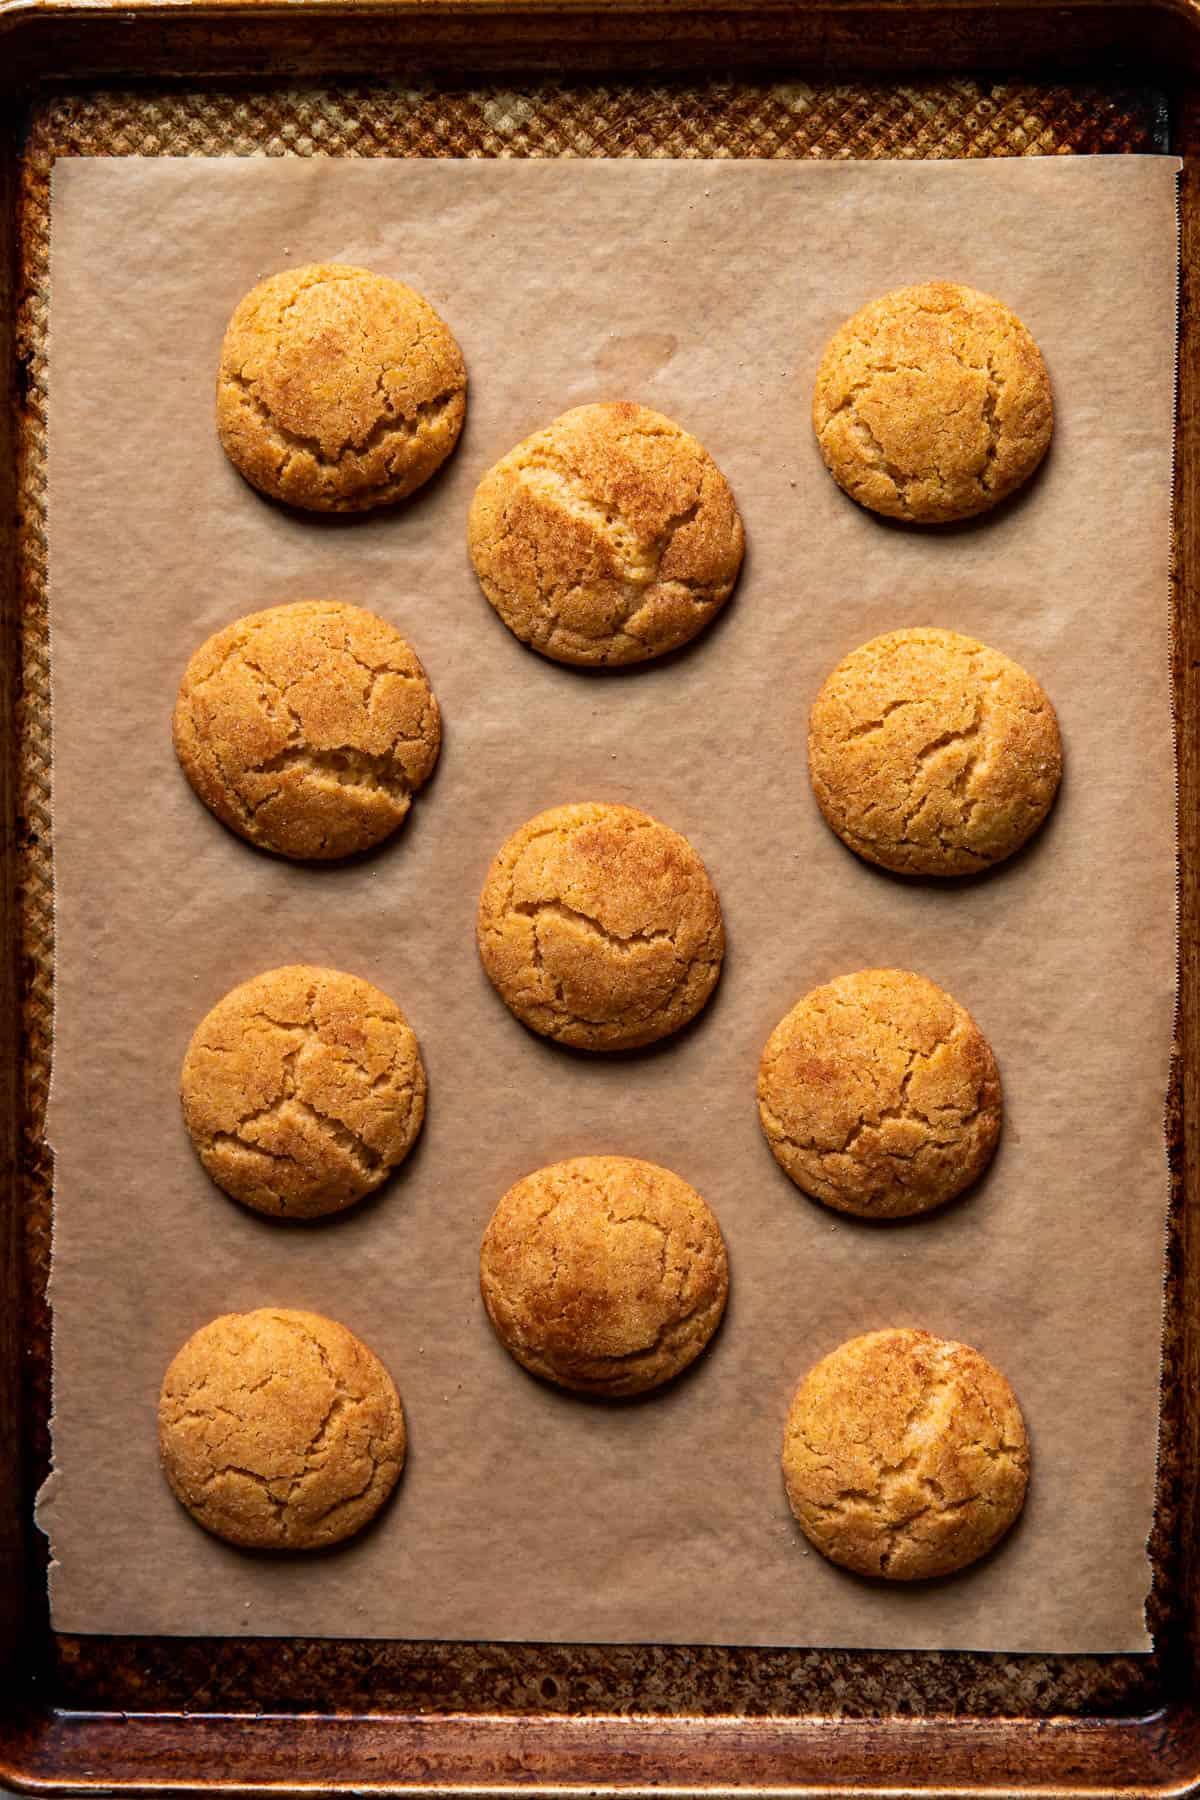 pumpkin spice snickerdoodles on a baking pan.